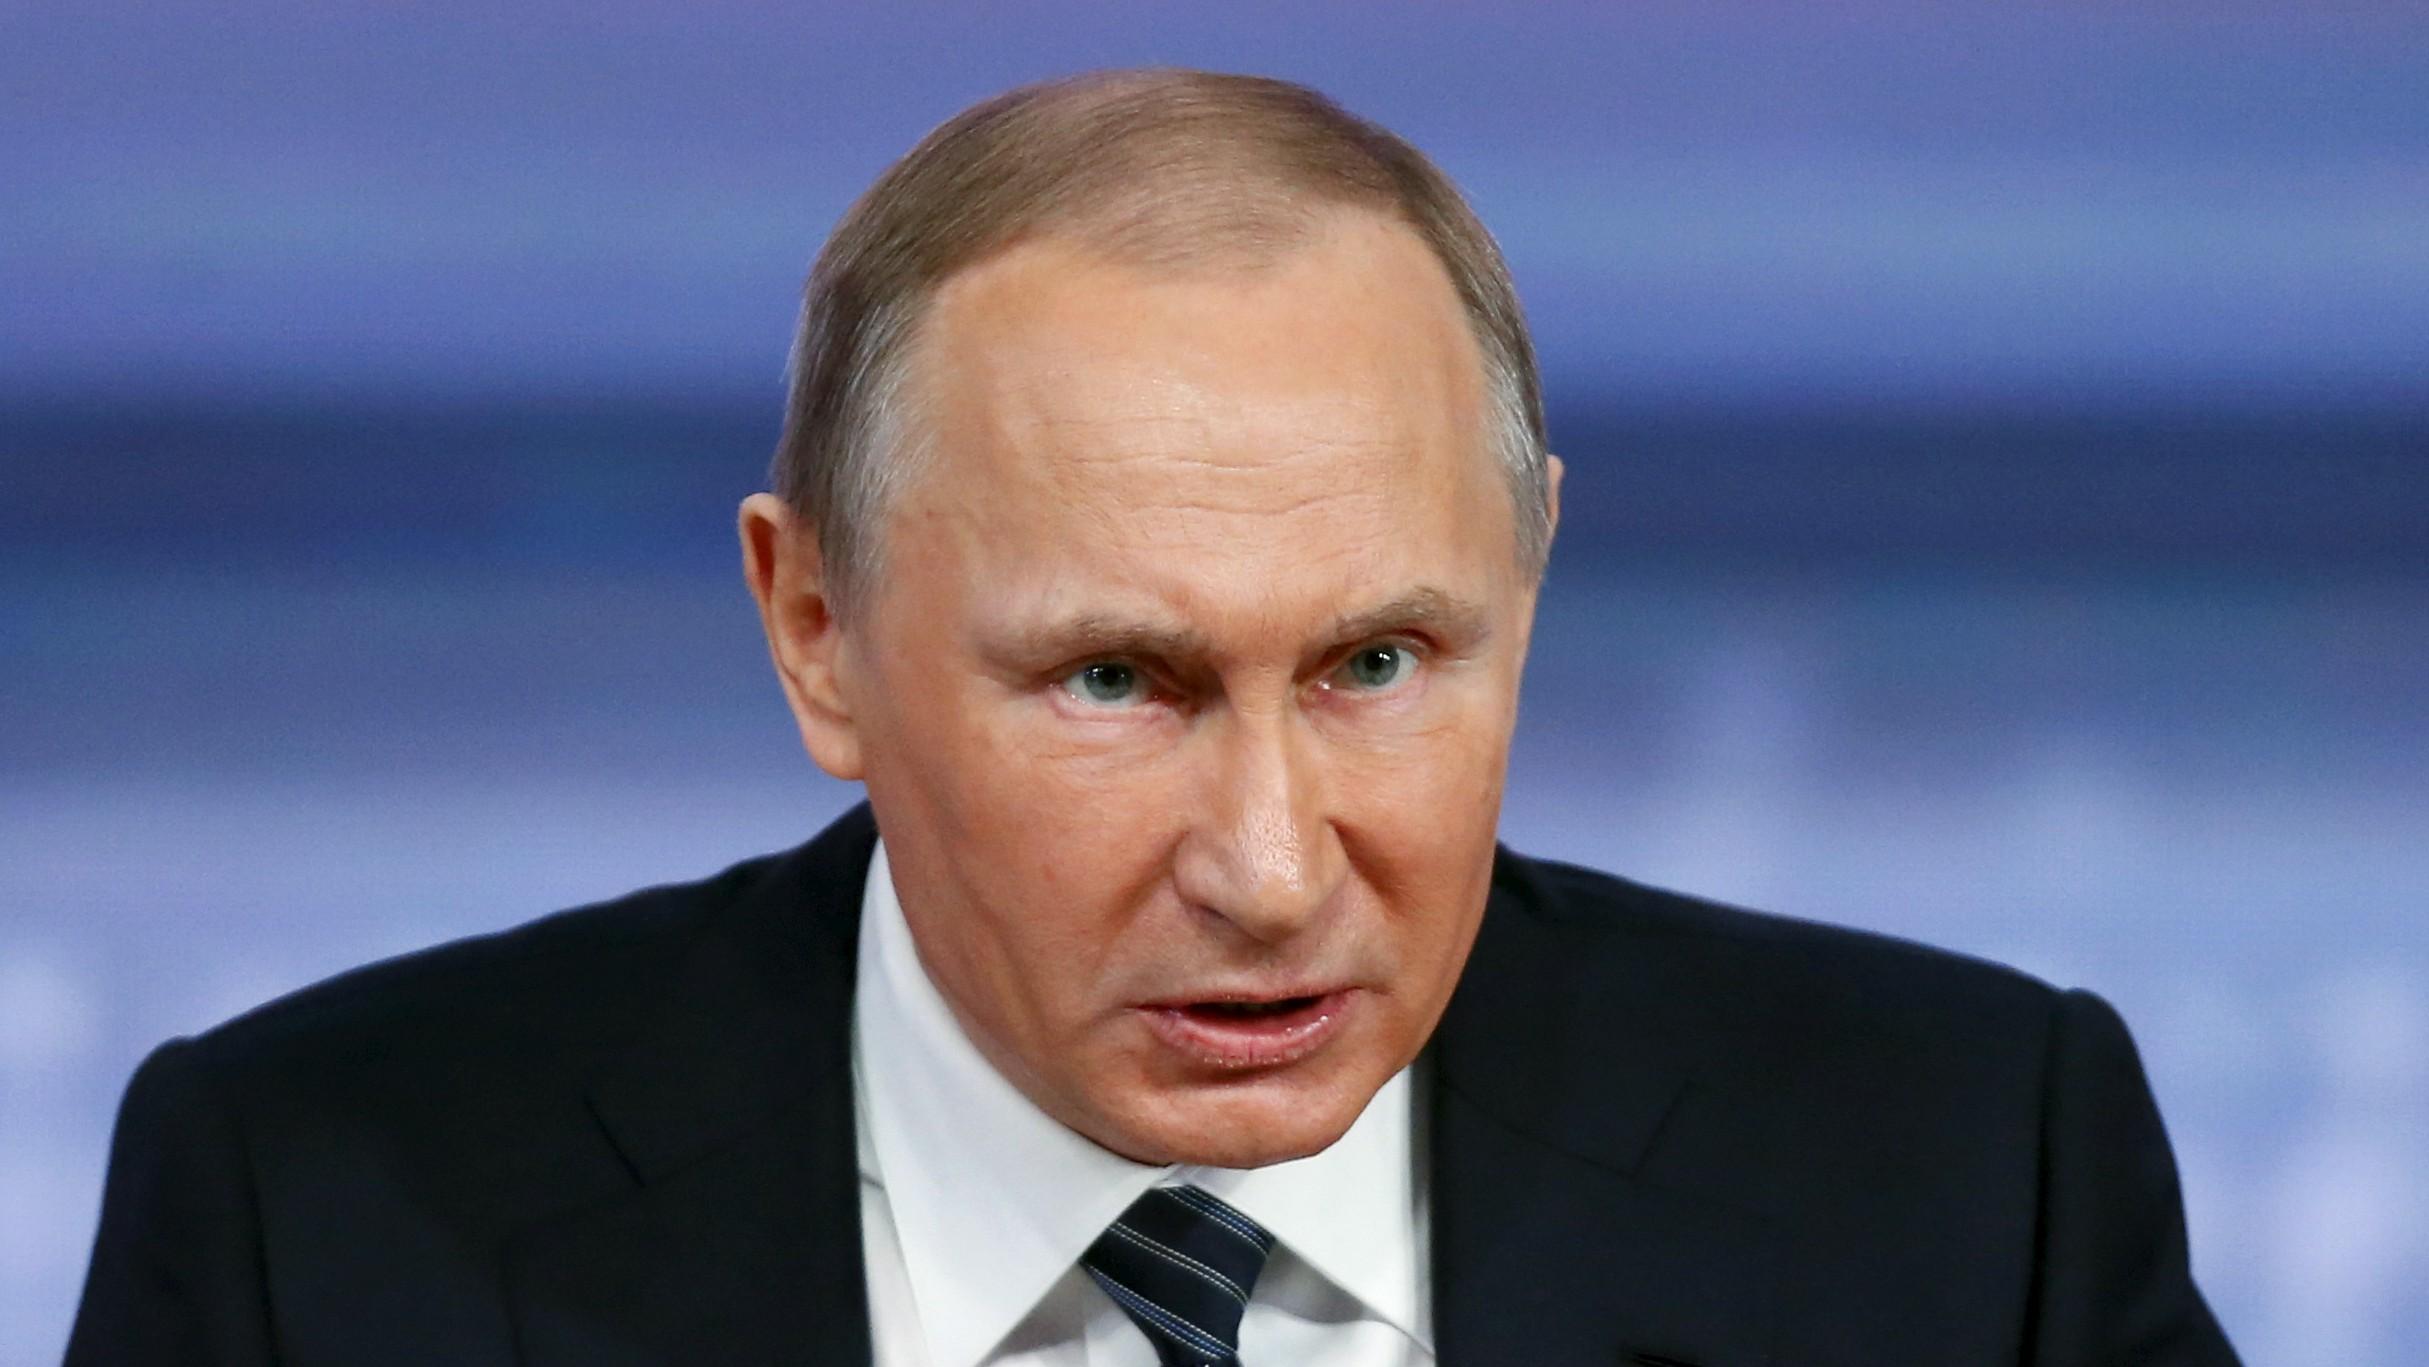 Putin at his annual press conference.